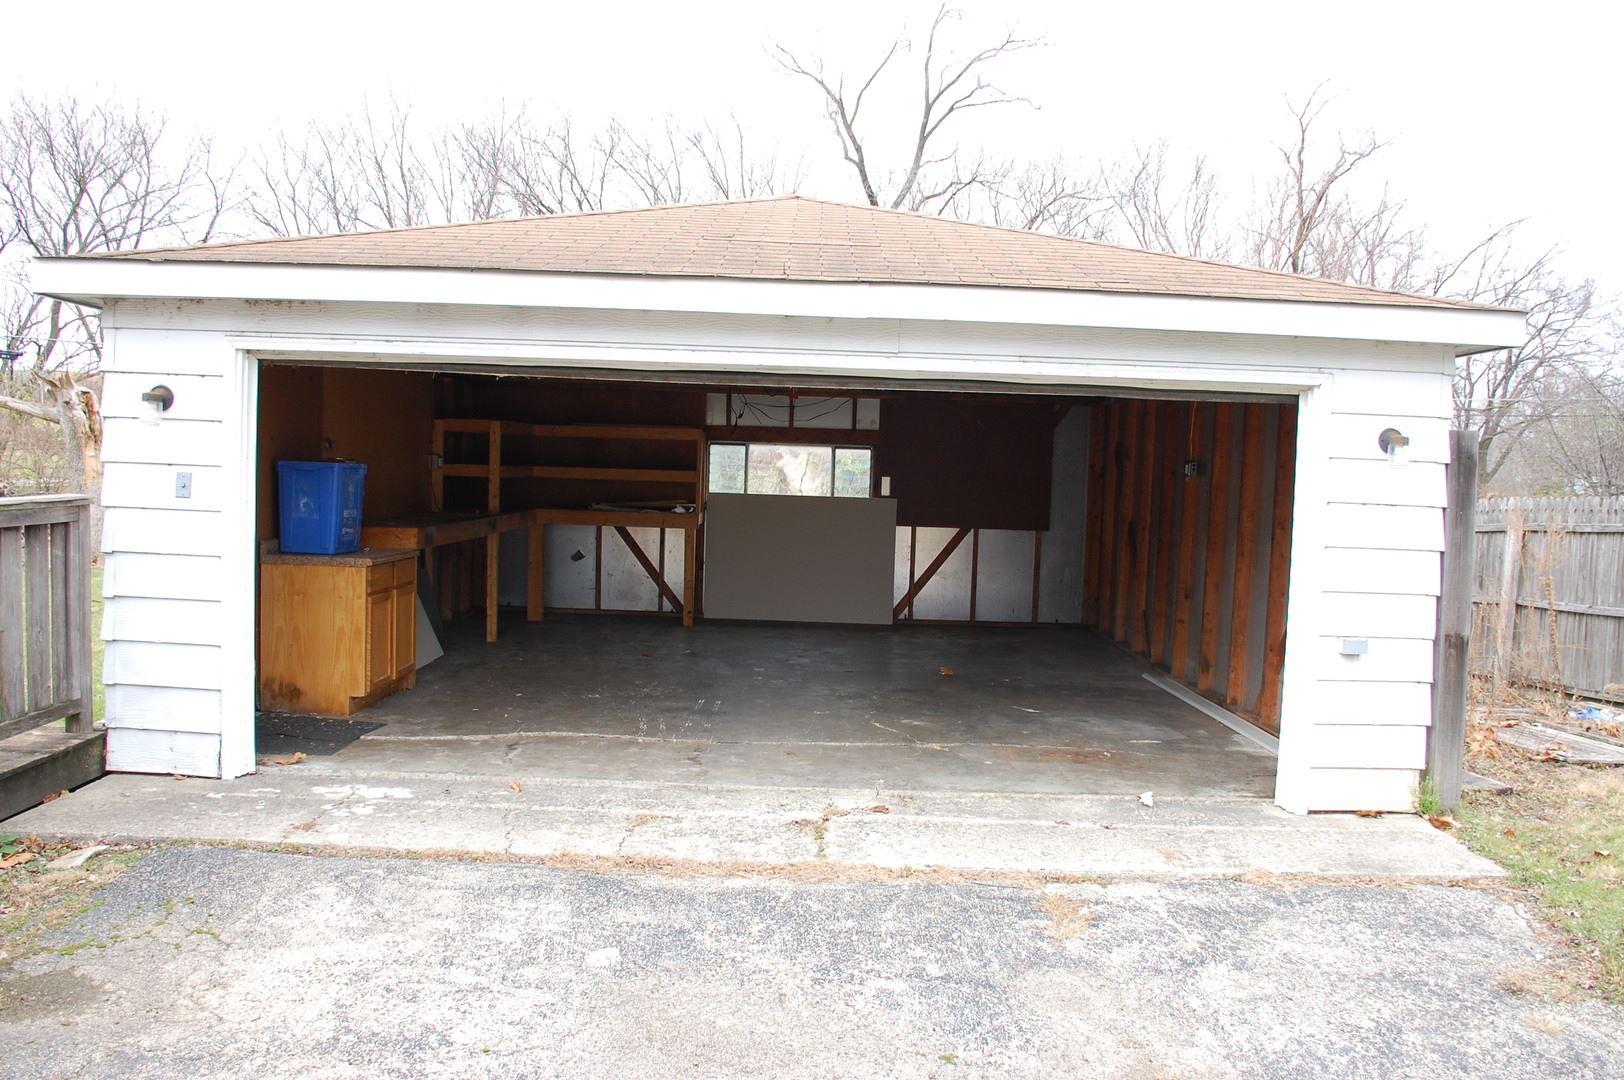 Photo of 232 Glengary Drive, Bolingbrook, IL 60440 (MLS # 10944798)